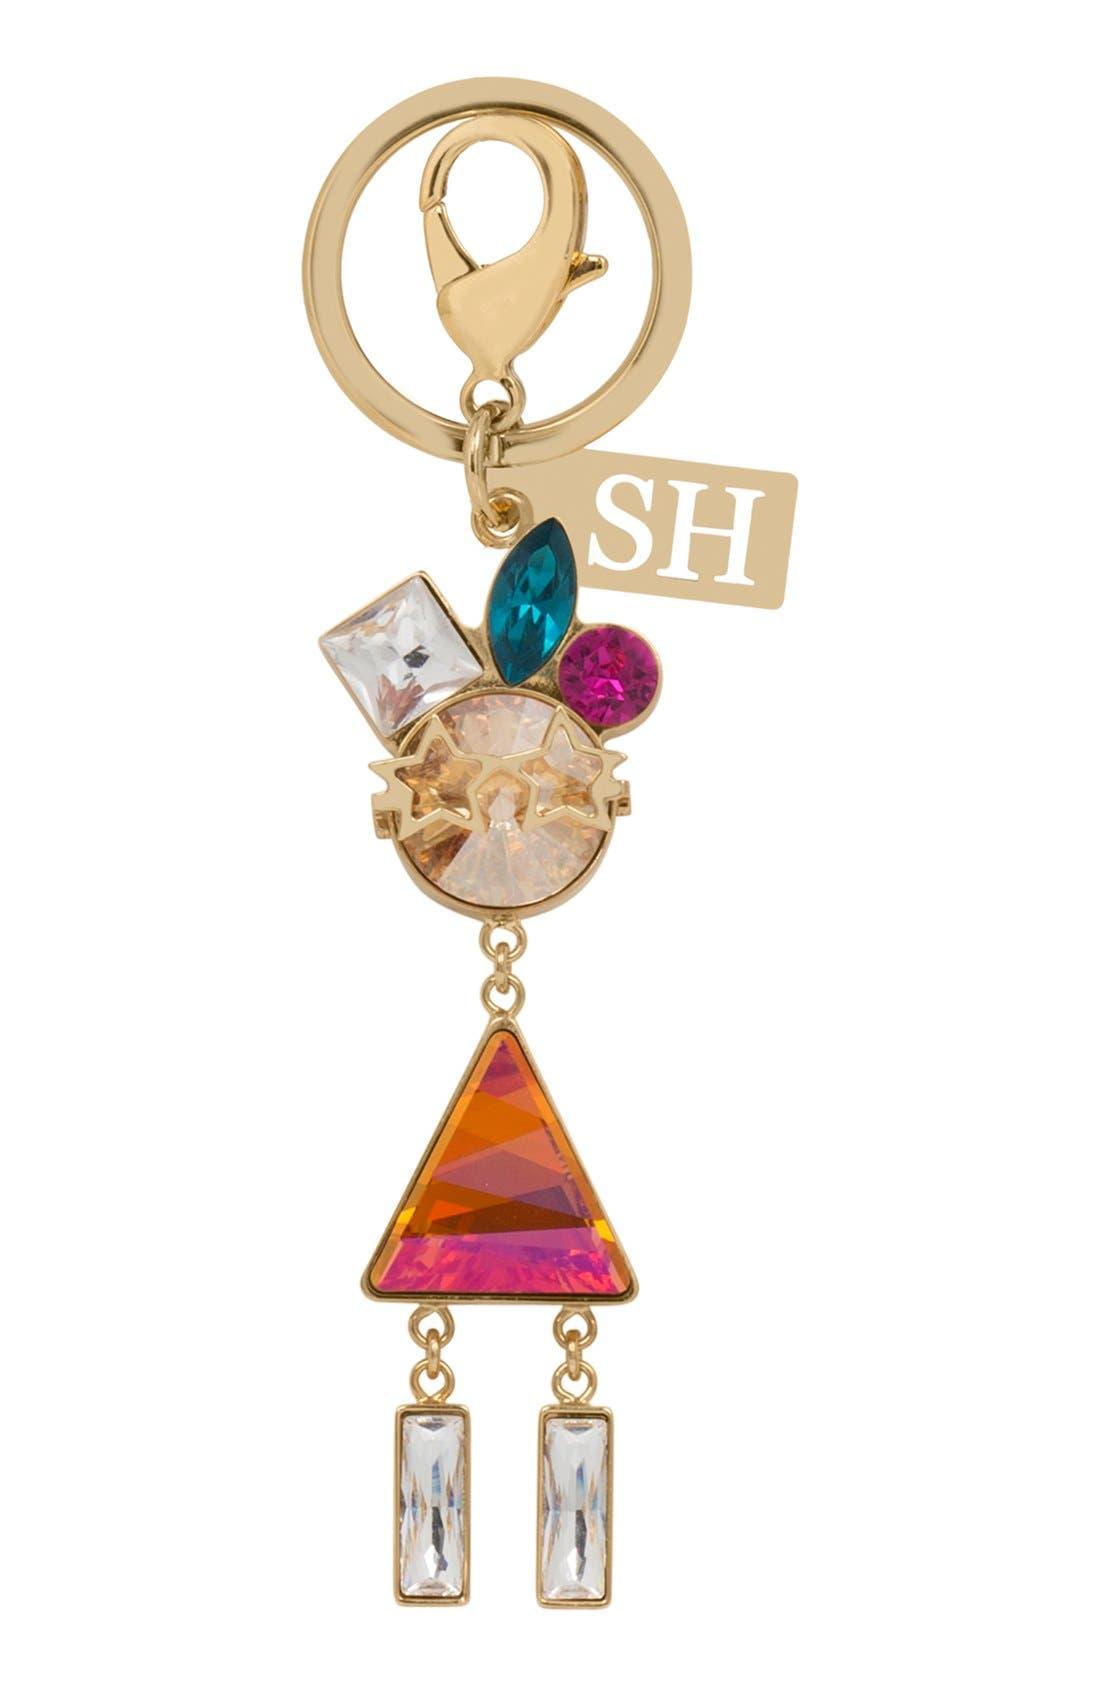 Alternate Image 1 Selected - Sophie Hulme 'Shirley' Bag Charm